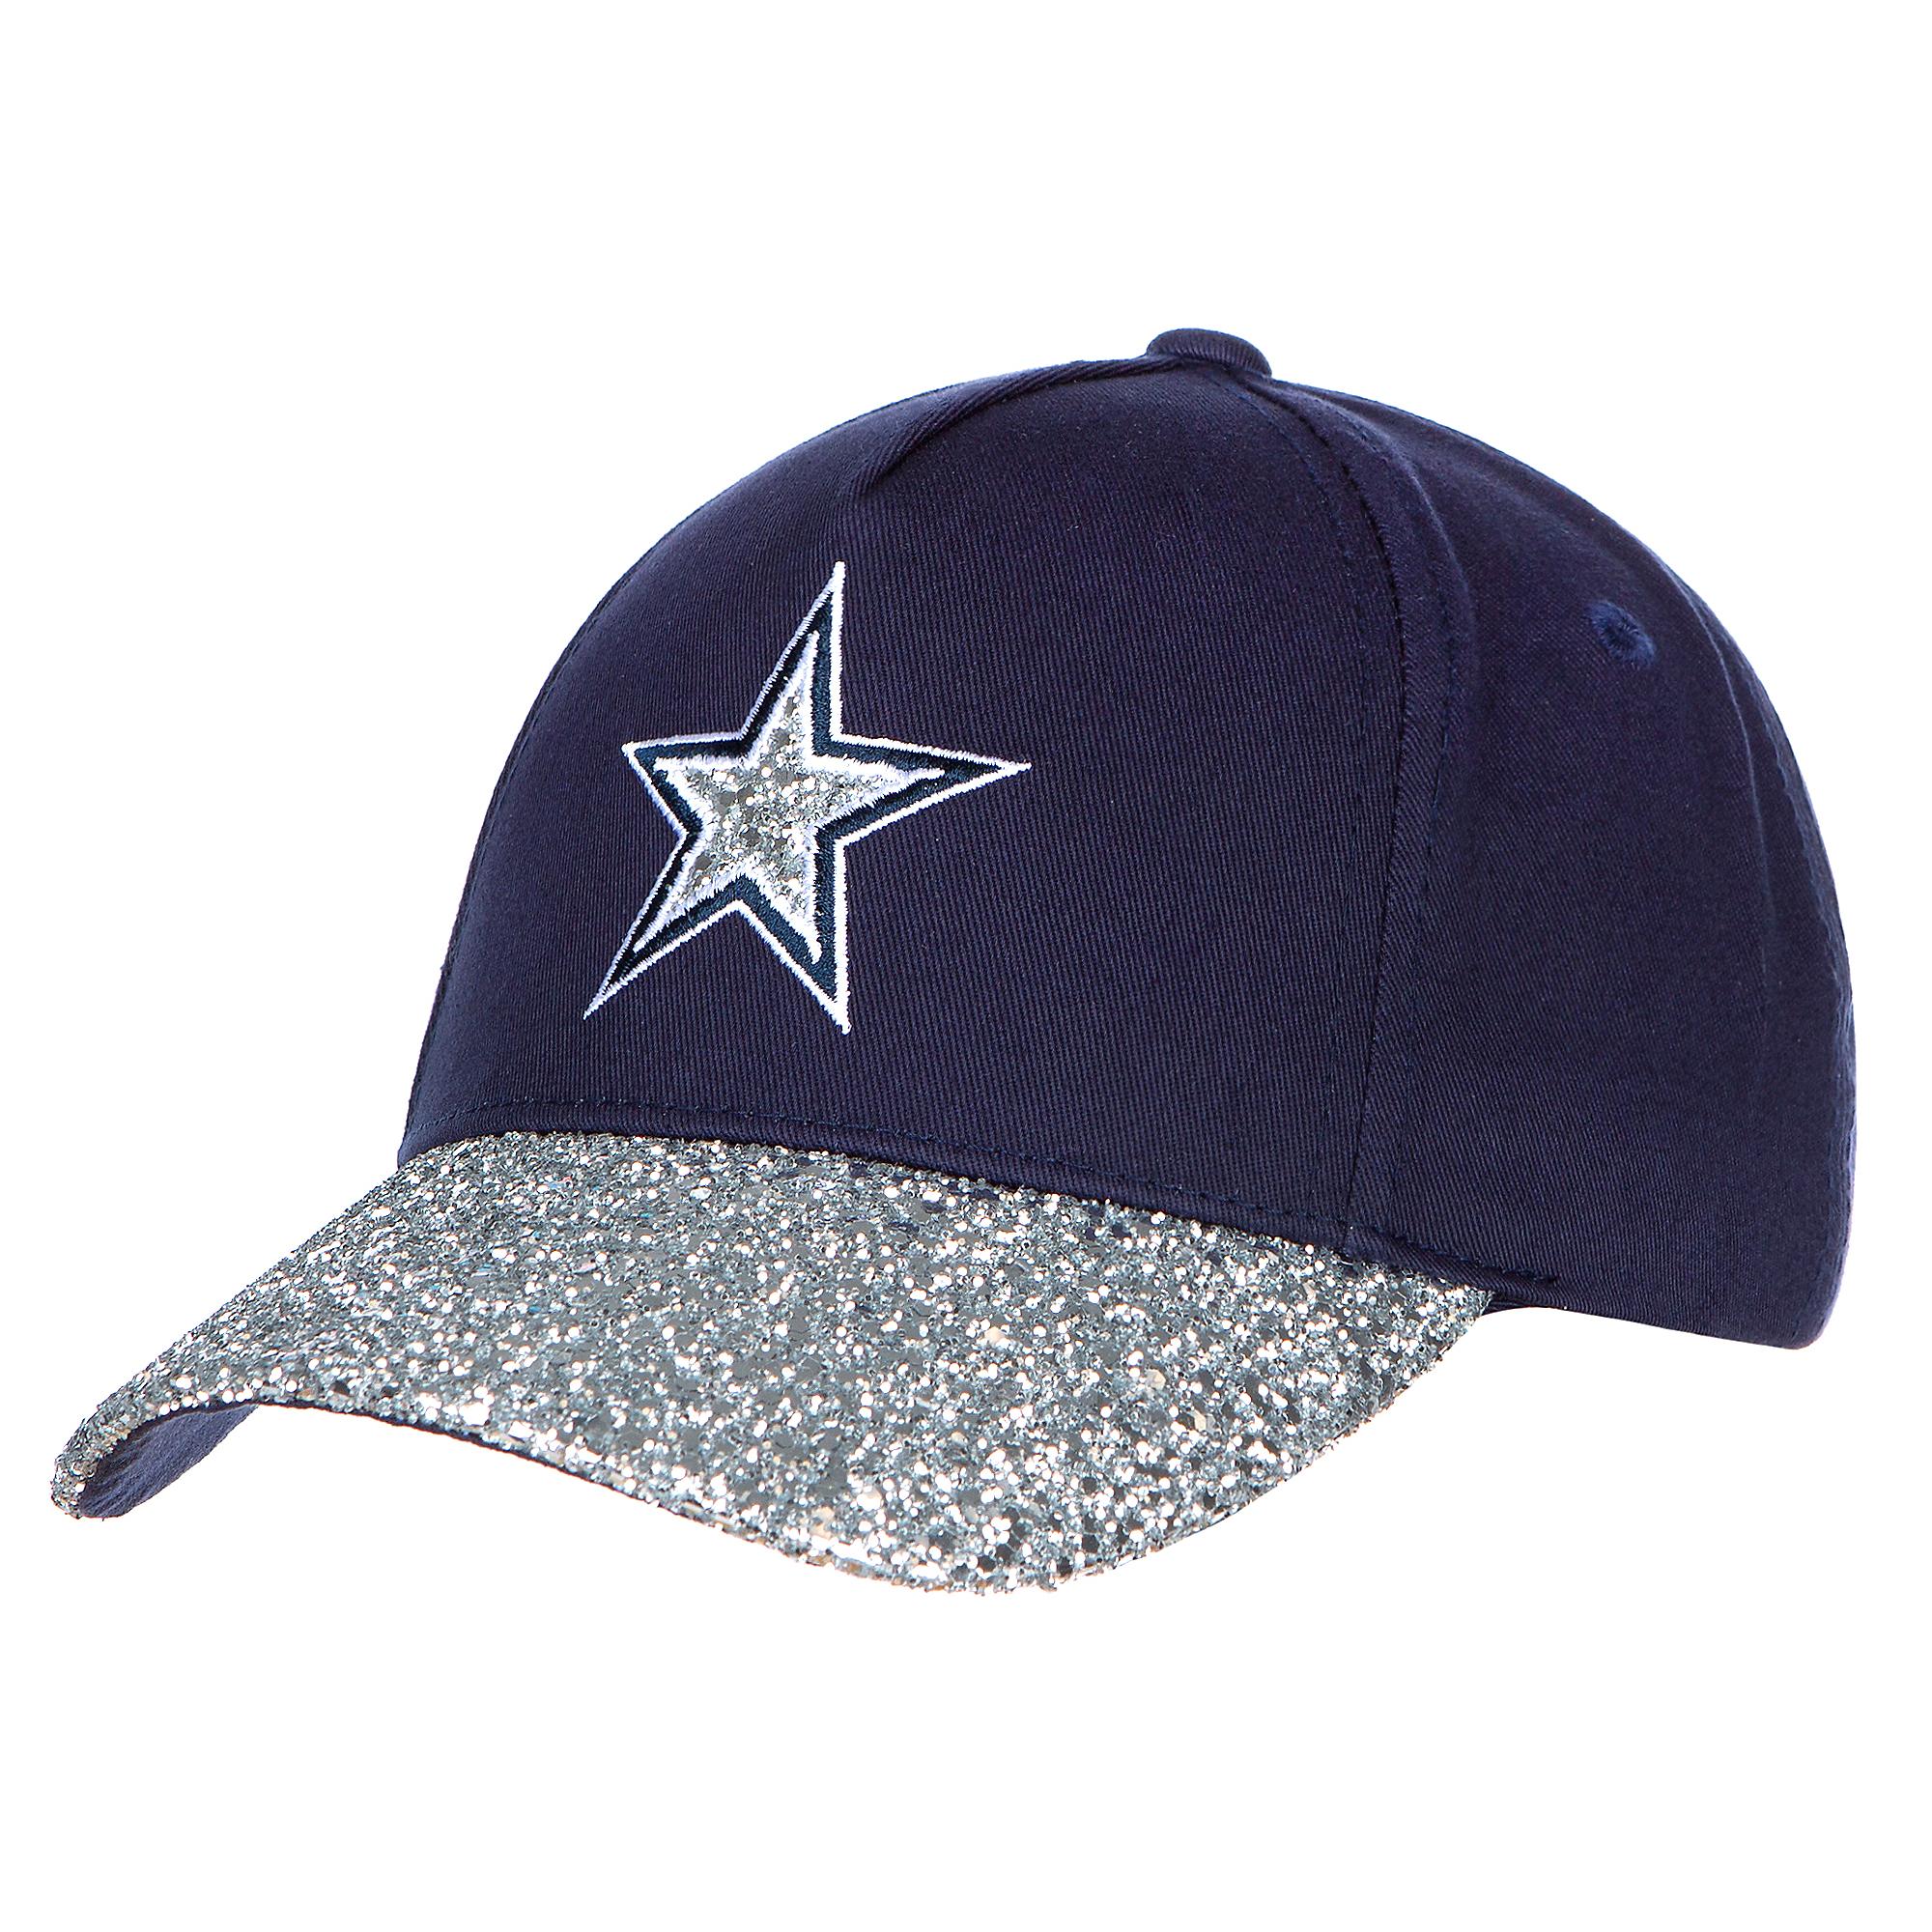 Dallas Cowboys Girls Navy and Silver Roxy Cap